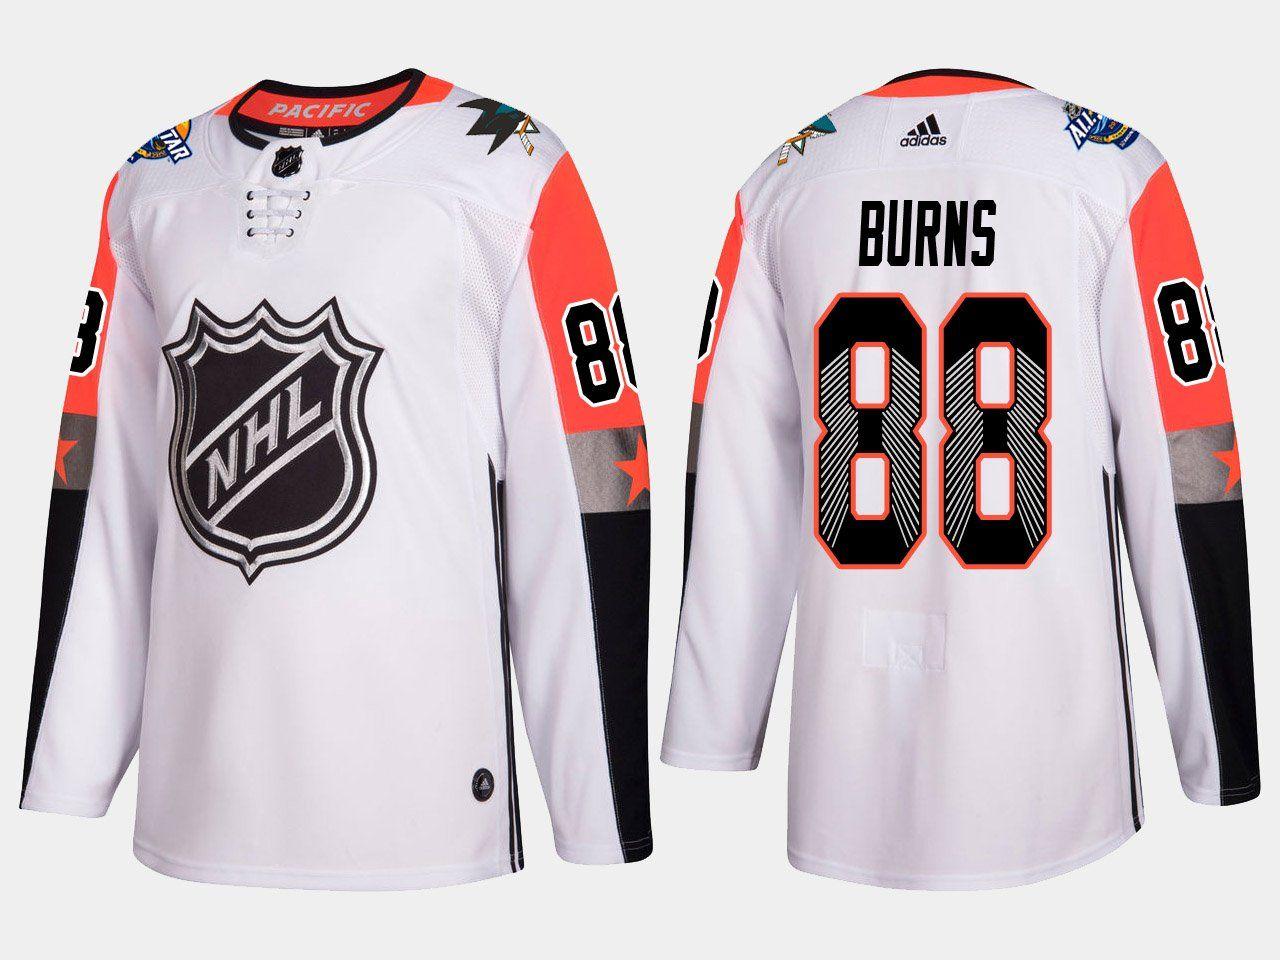 pretty nice 5b05e ec644 2018 NHL All Star Pacific Division Premier Adidas Jerseys ...